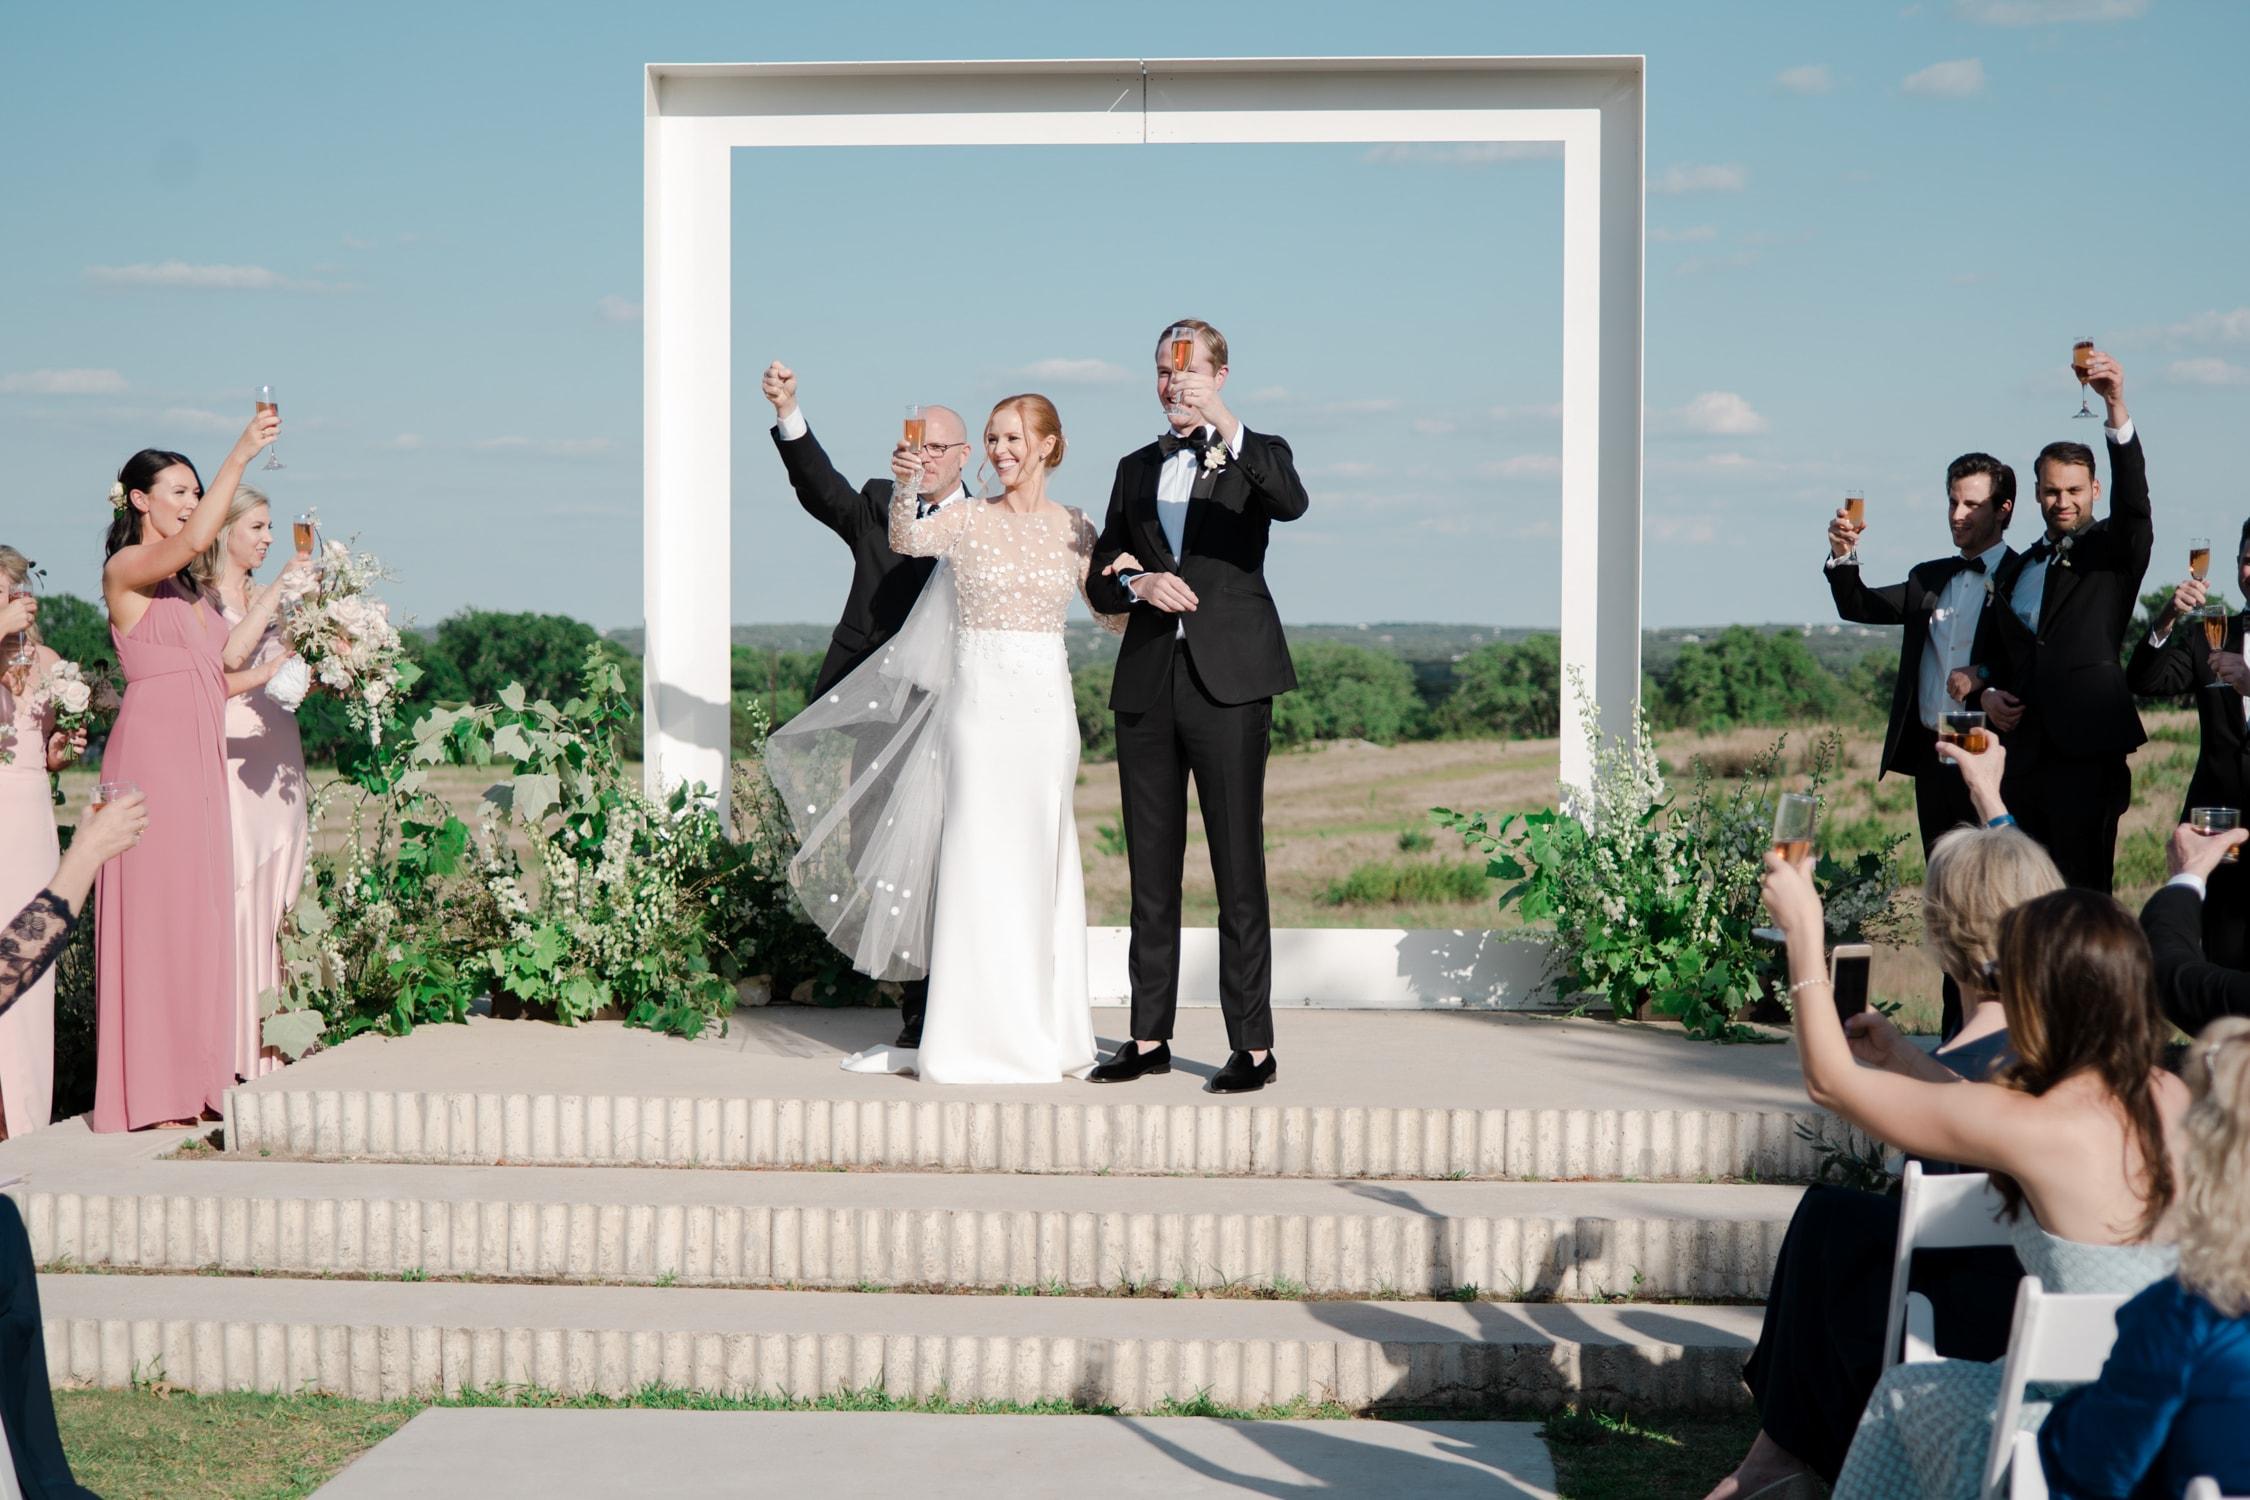 PROSPECT_HOUSE_WEDDING_AUSTIN_TX_MATTHEW_MOORE-00531.jpg